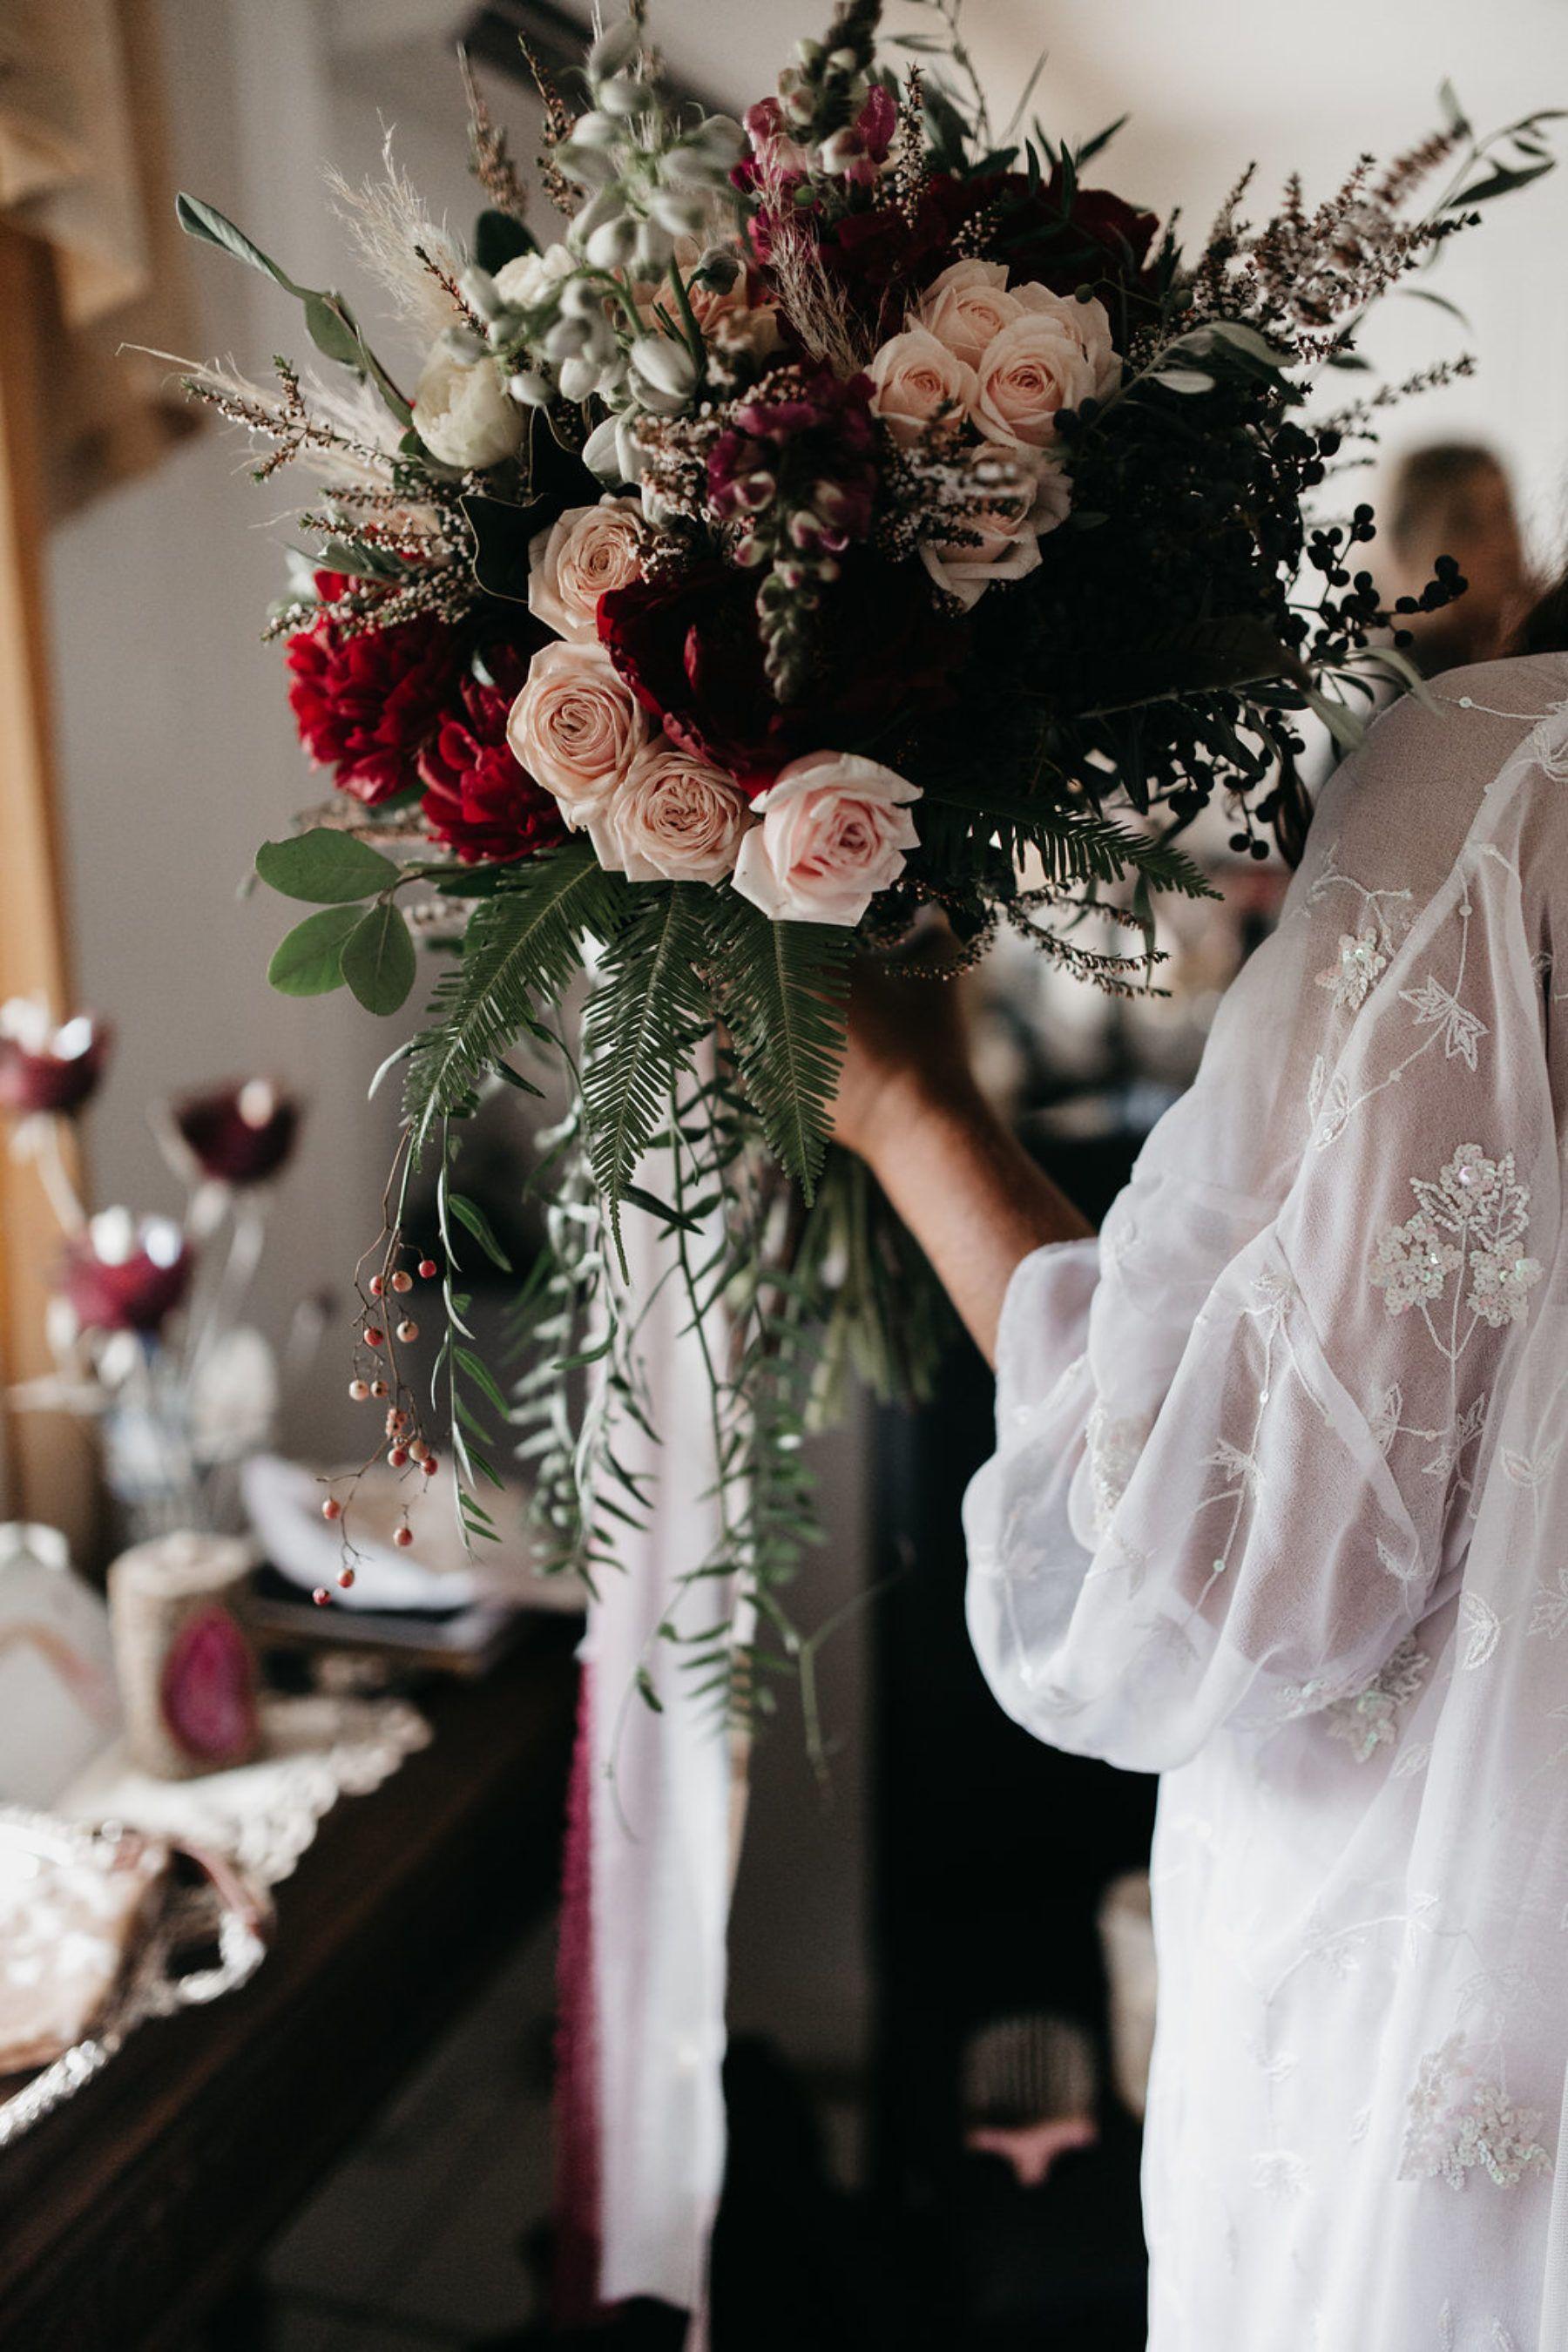 Josh Vicki S Glam Cattle Station Wedding Nouba Com Au Bohemian Wedding Bouquet Elegant Wedding Bouquets Wedding